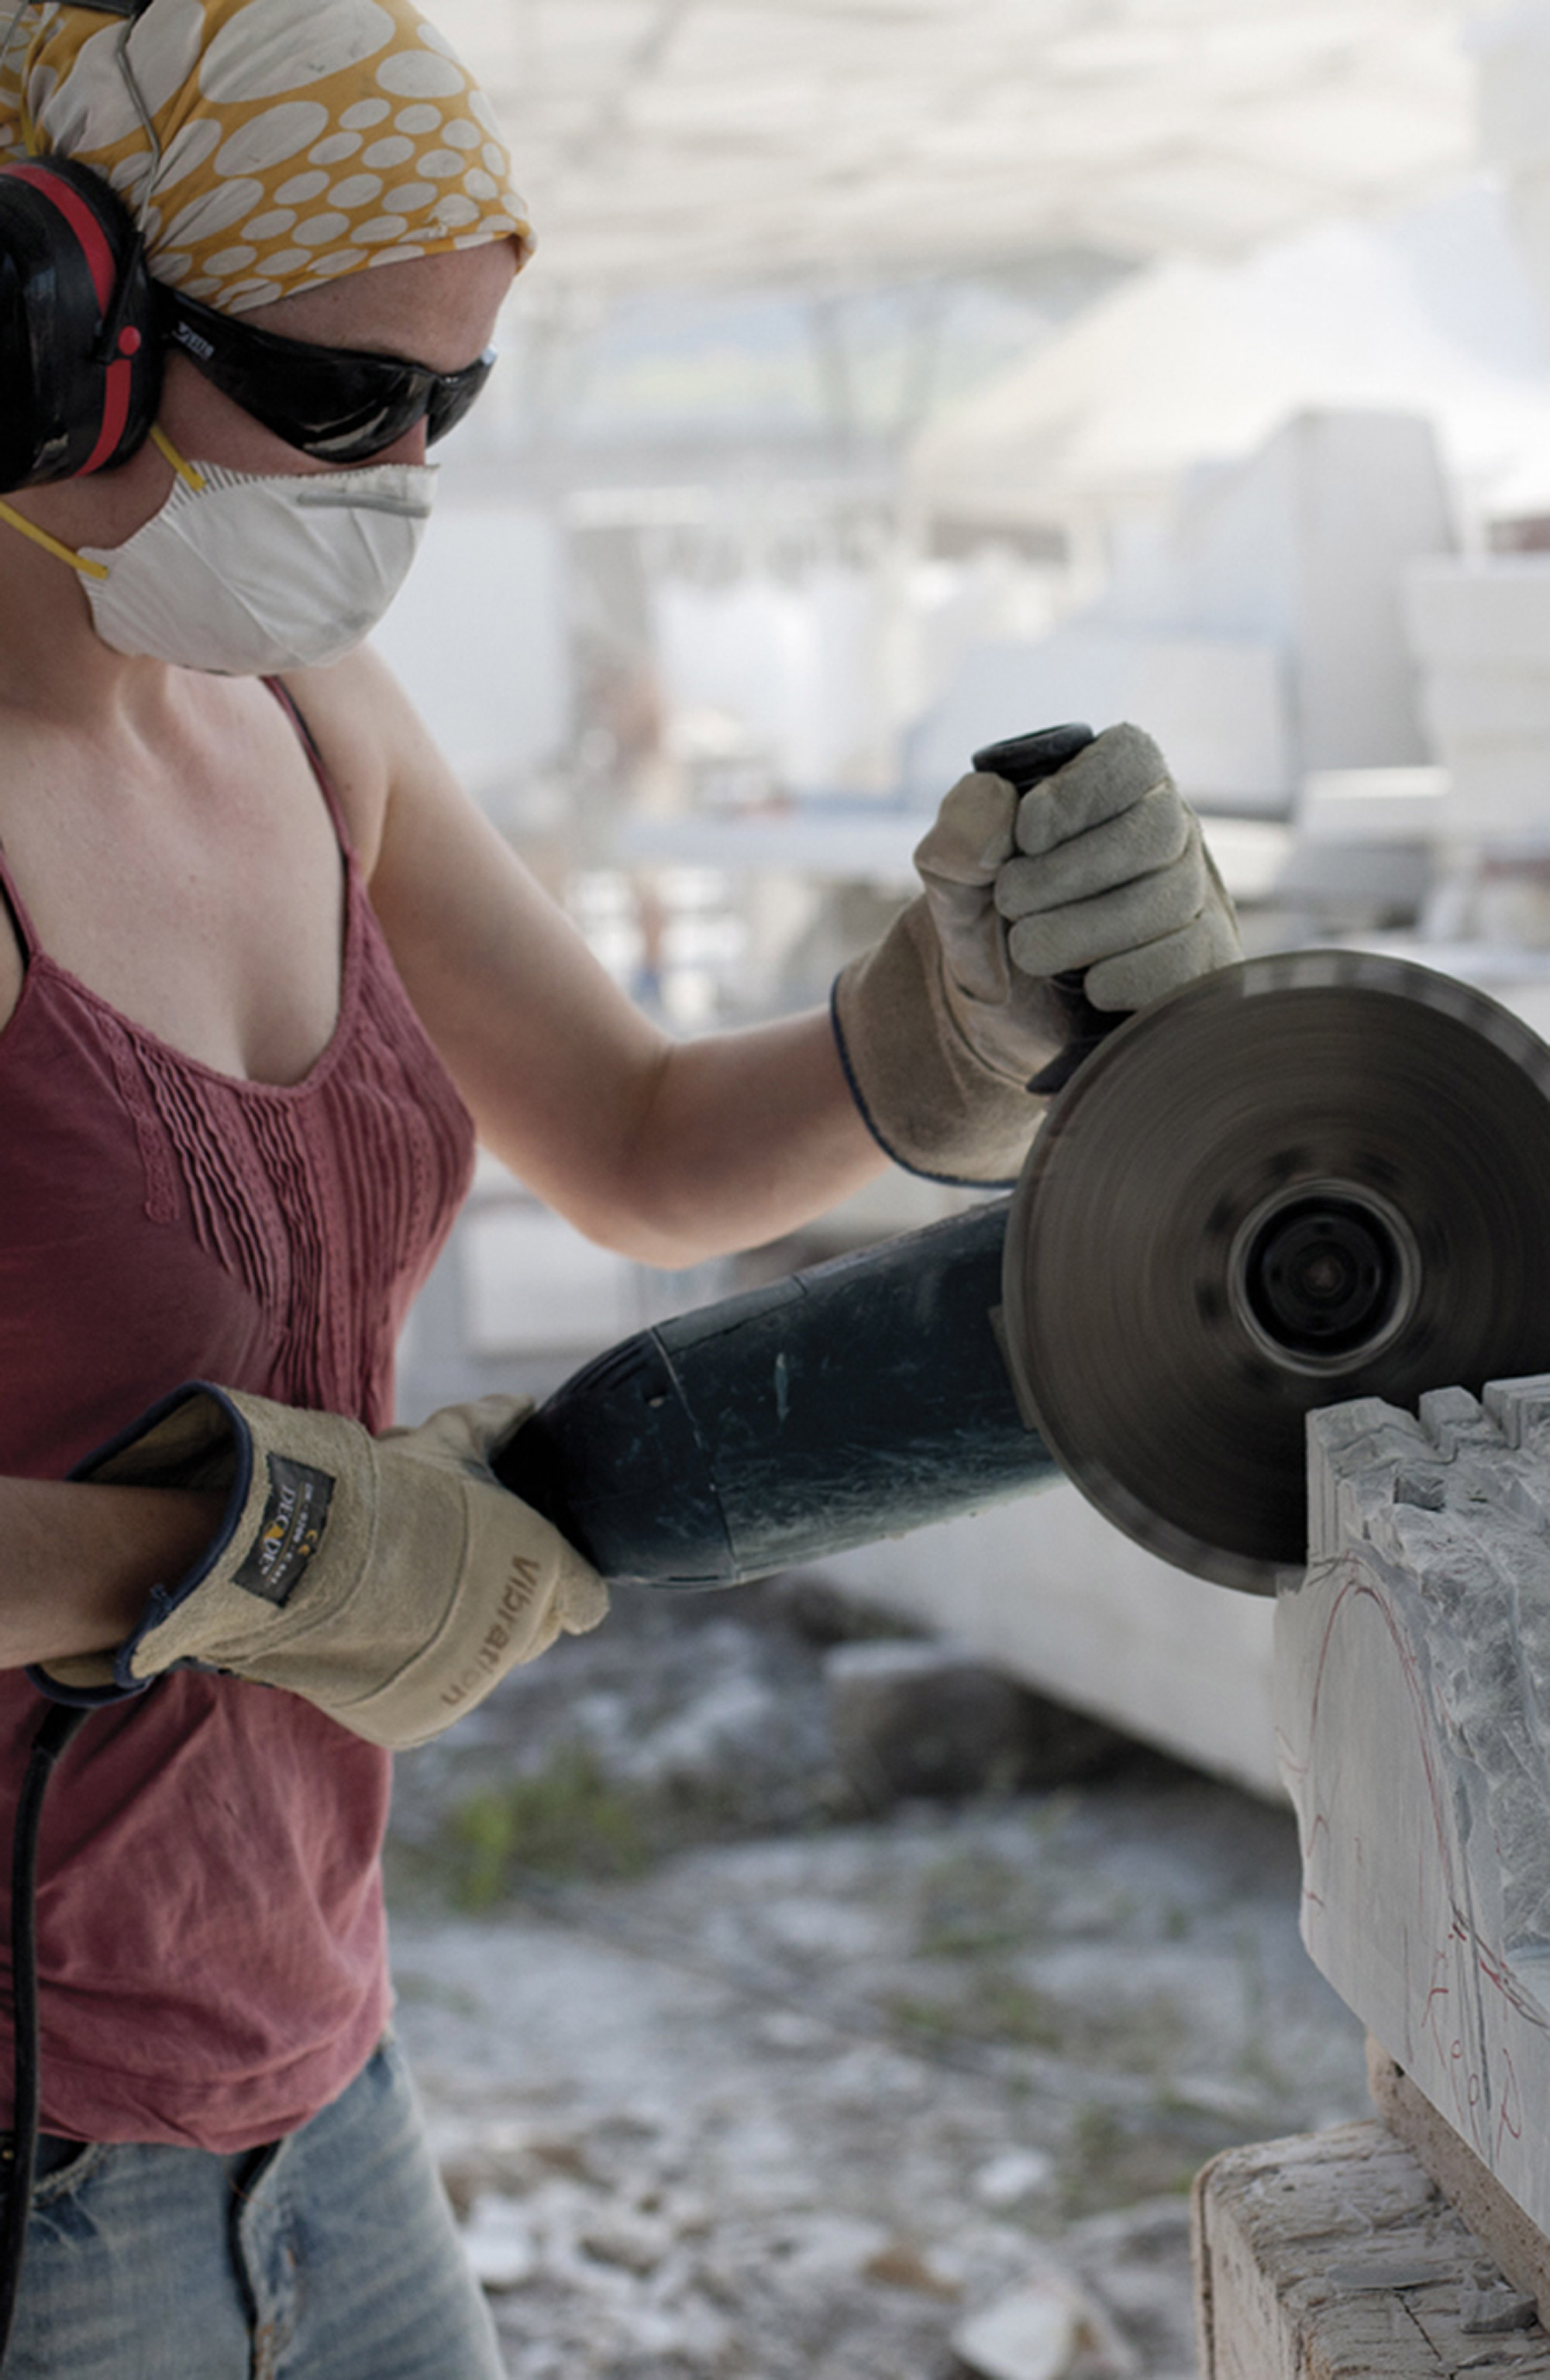 New-York-Academy-of-Art-Carrara-Residency-Heather-Personett-Zoe-Suenson-Taylor20171213_0052.jpg